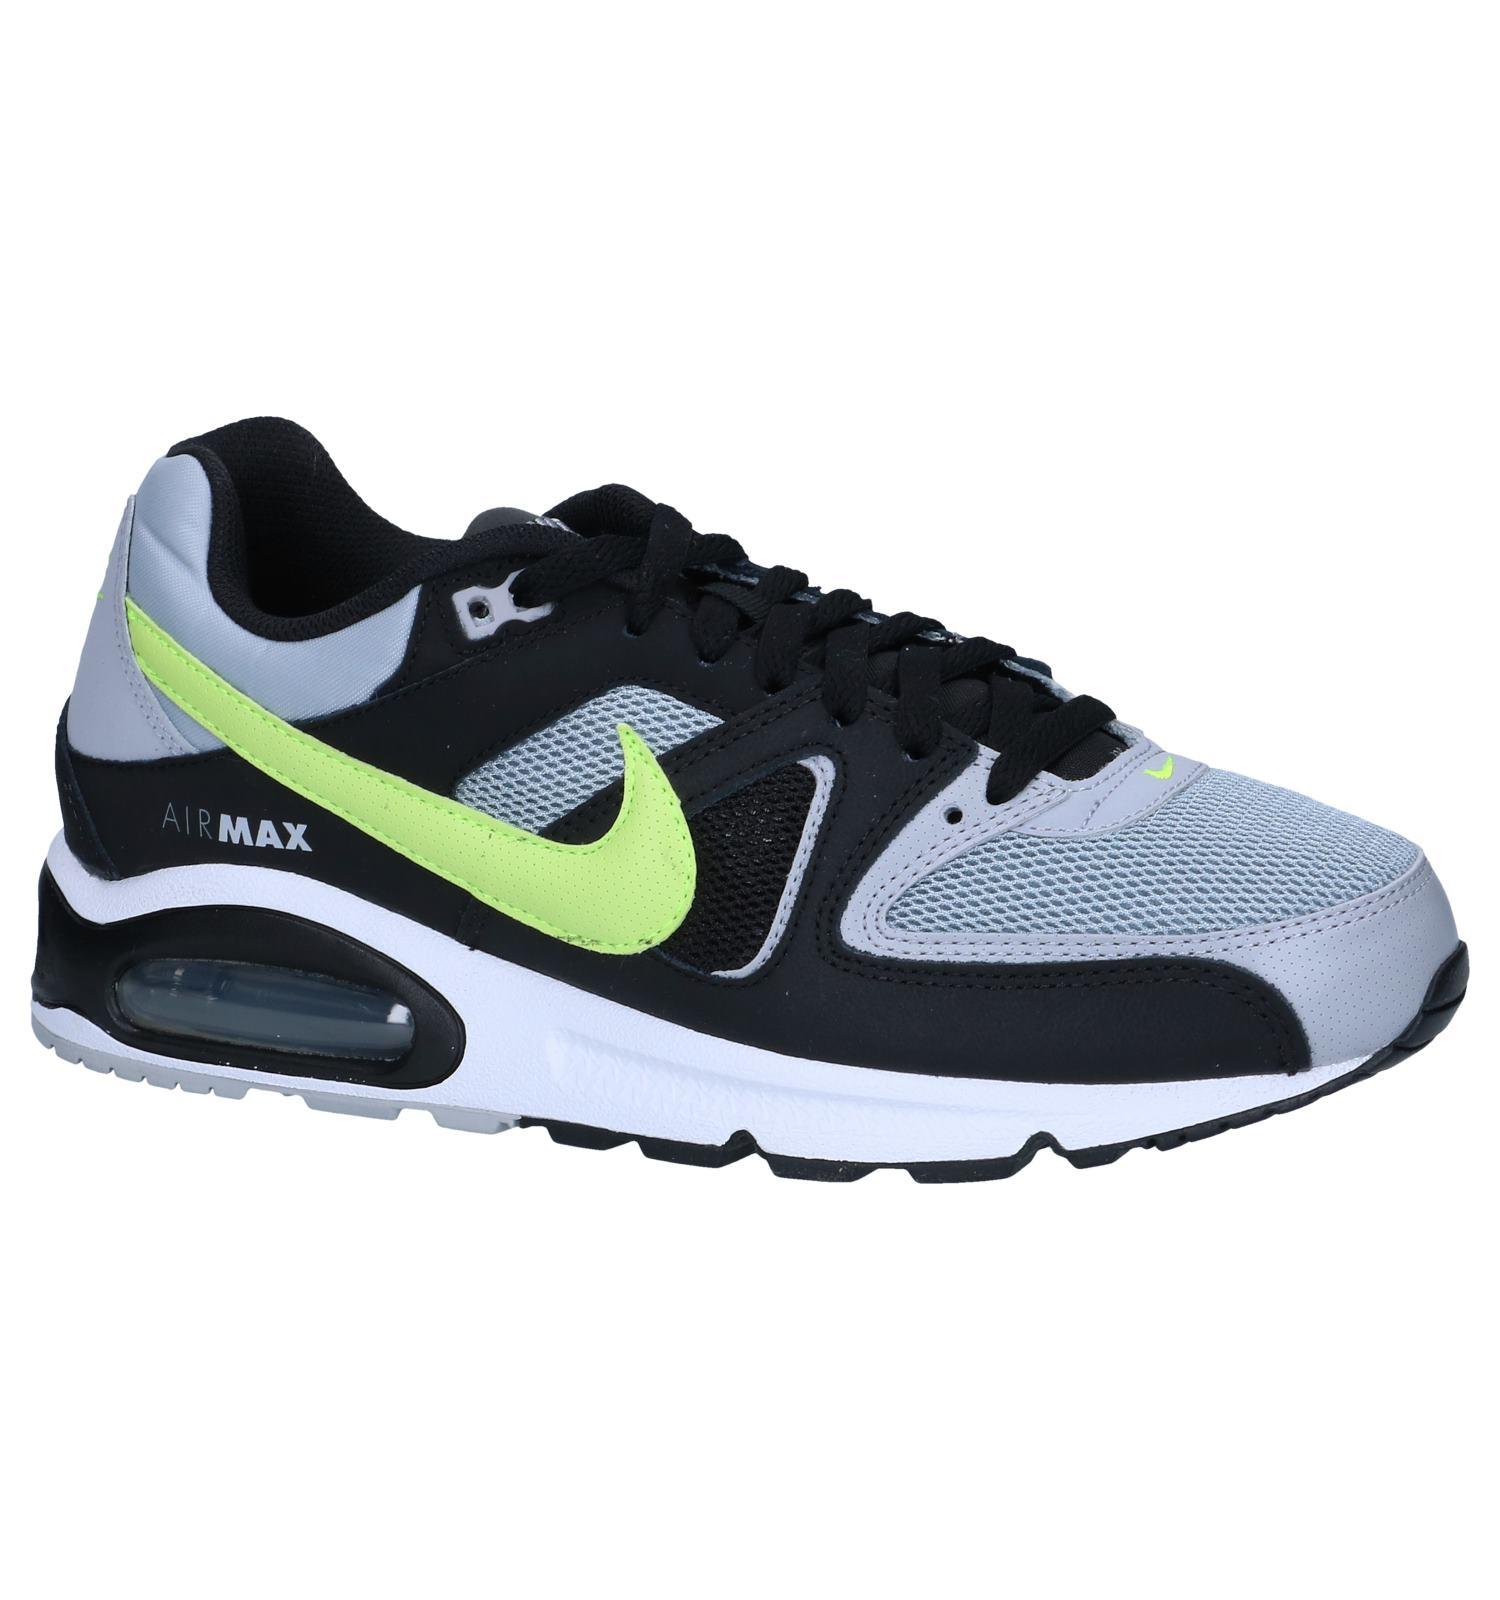 76efbbb6fec Zwart/Grijze Sneakers Nike Air Max Command   TORFS.BE   Gratis verzend en  retour